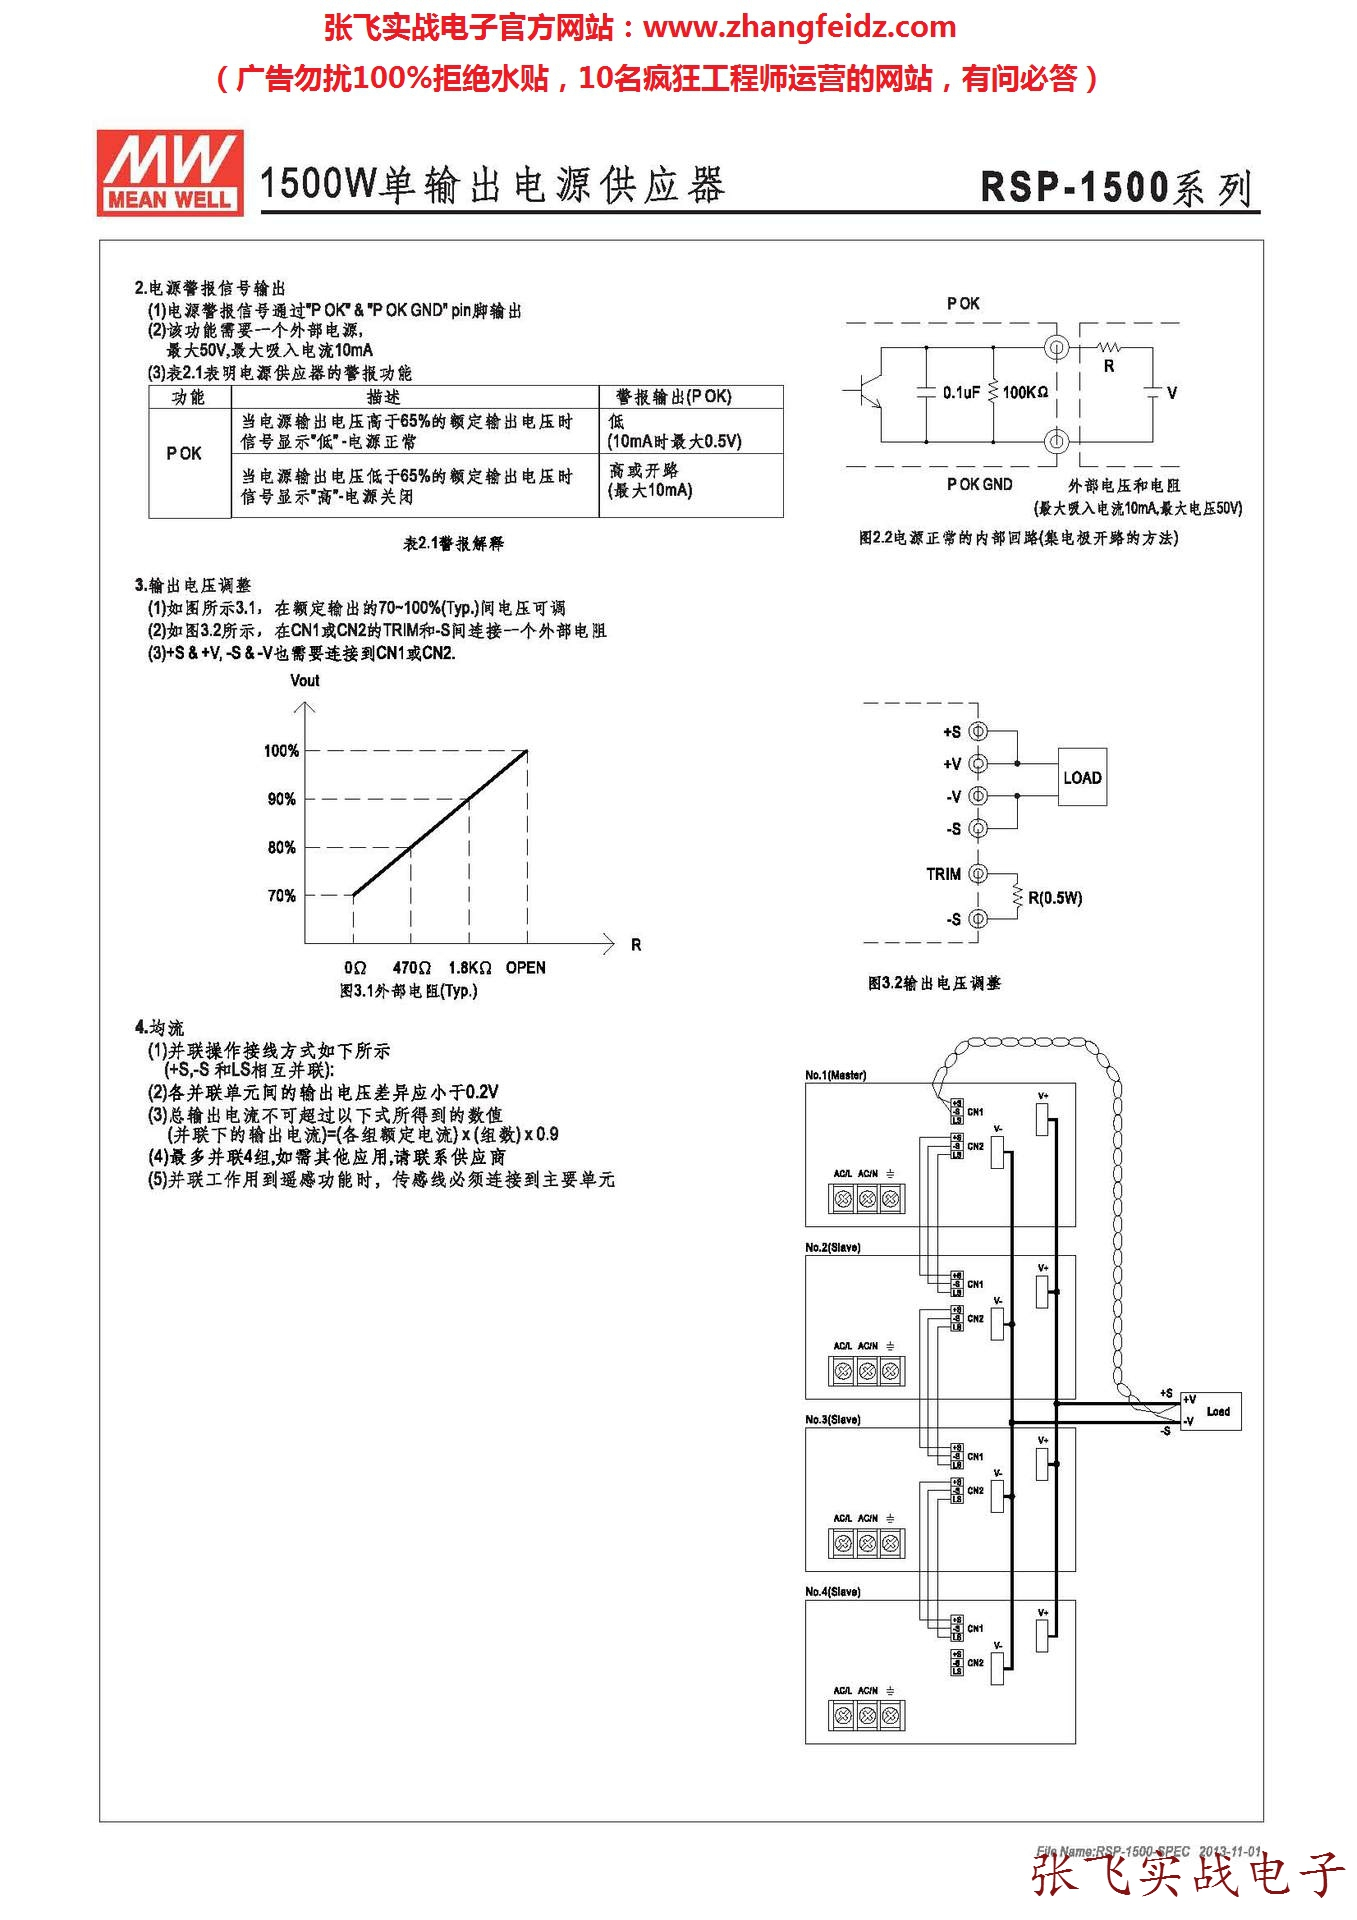 RSP-1500系列功能手册.jpg